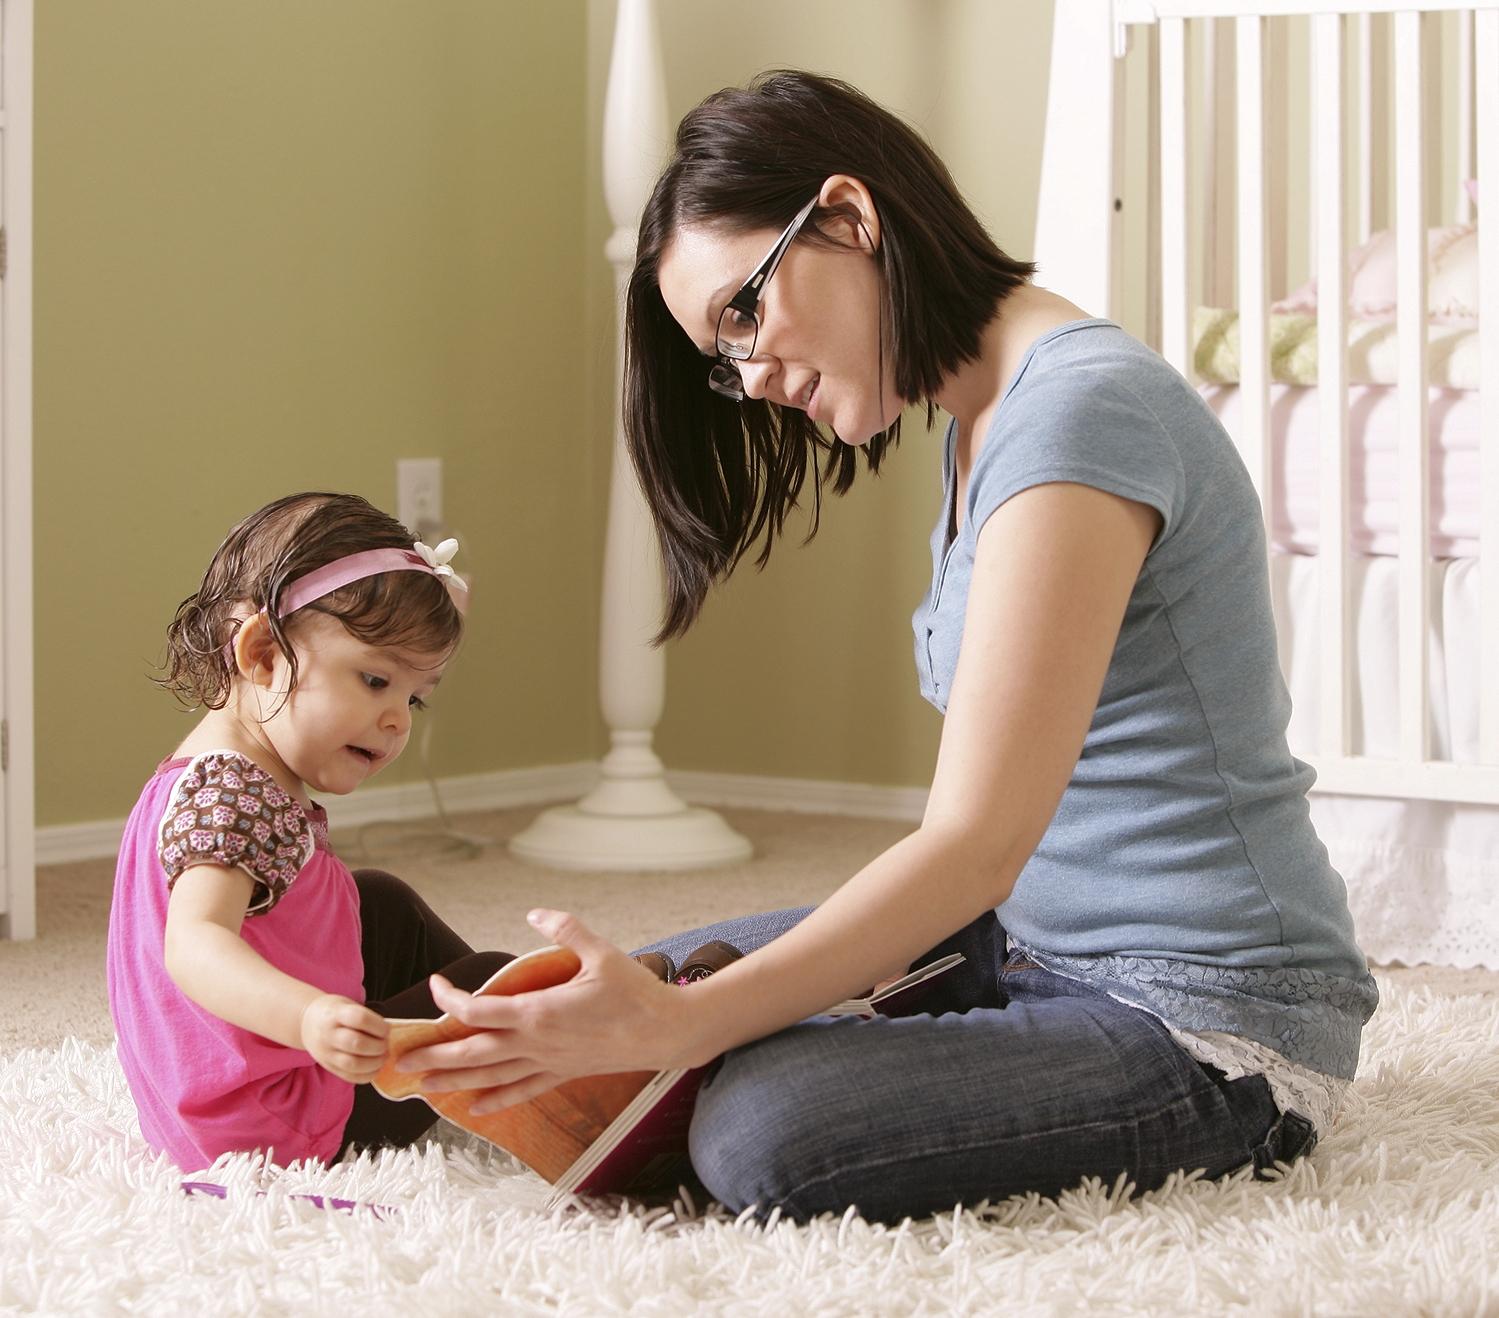 babysitter hastighed dating